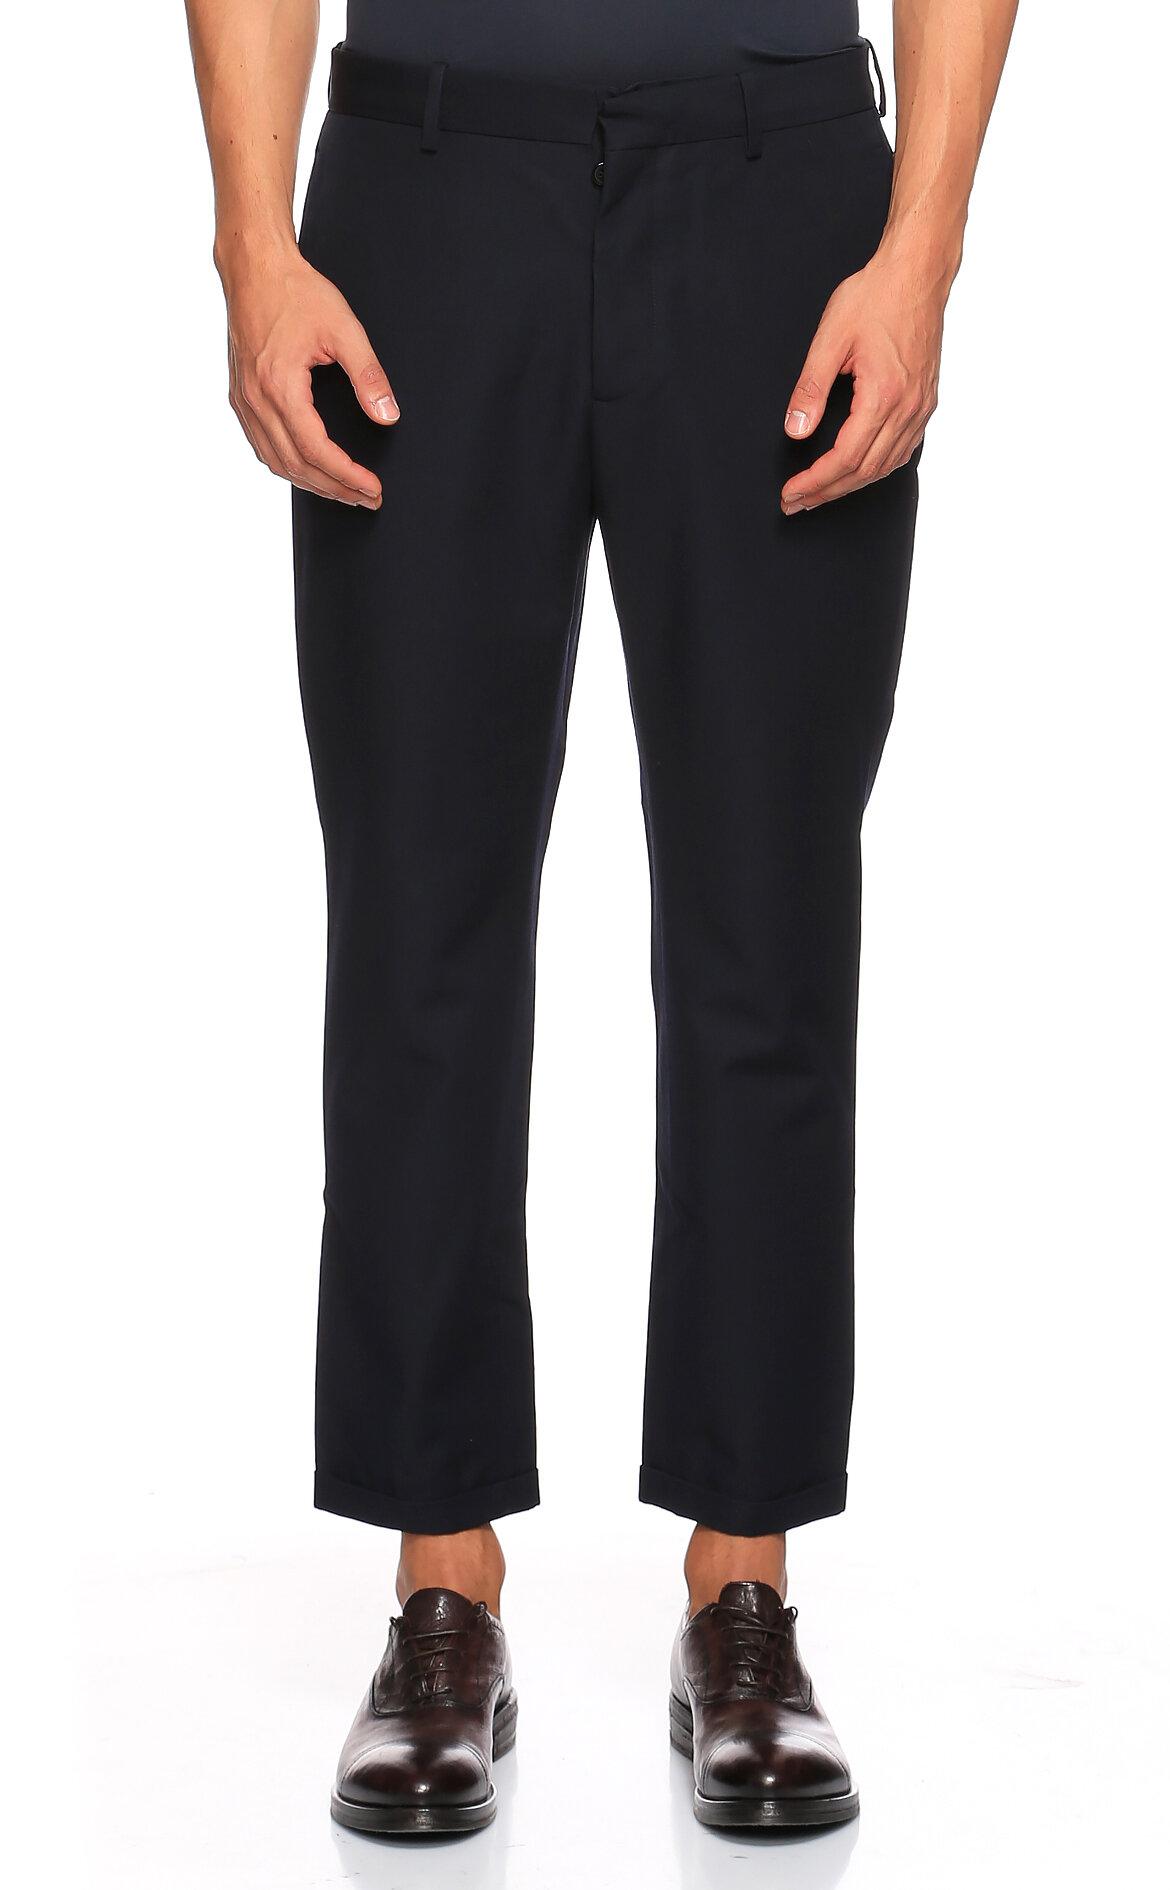 Marni-Marni Lacivert Pantolon